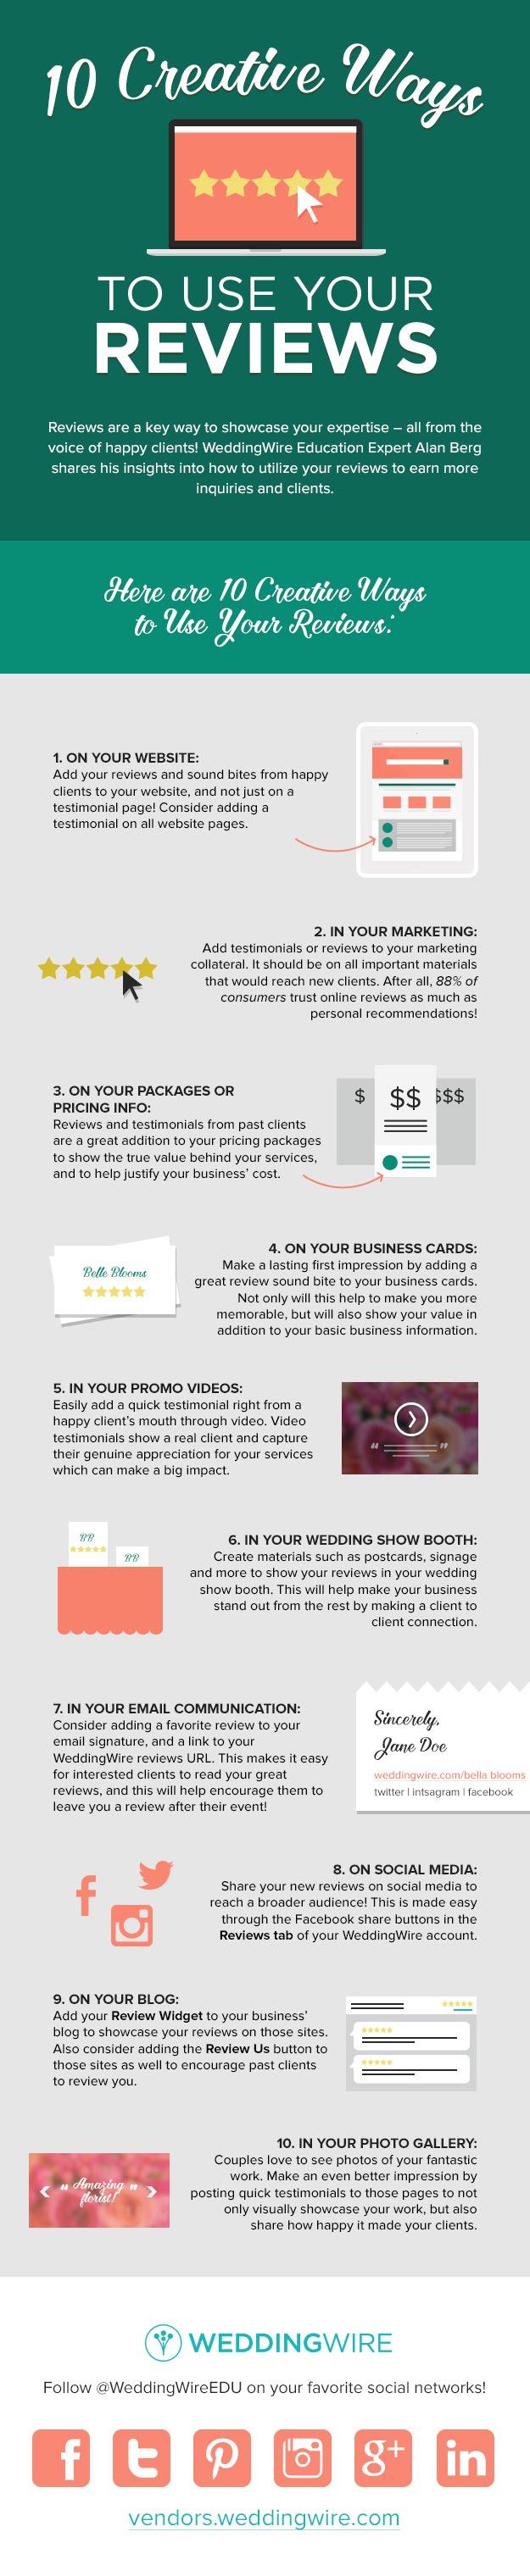 10_creative_ways_reviews_info